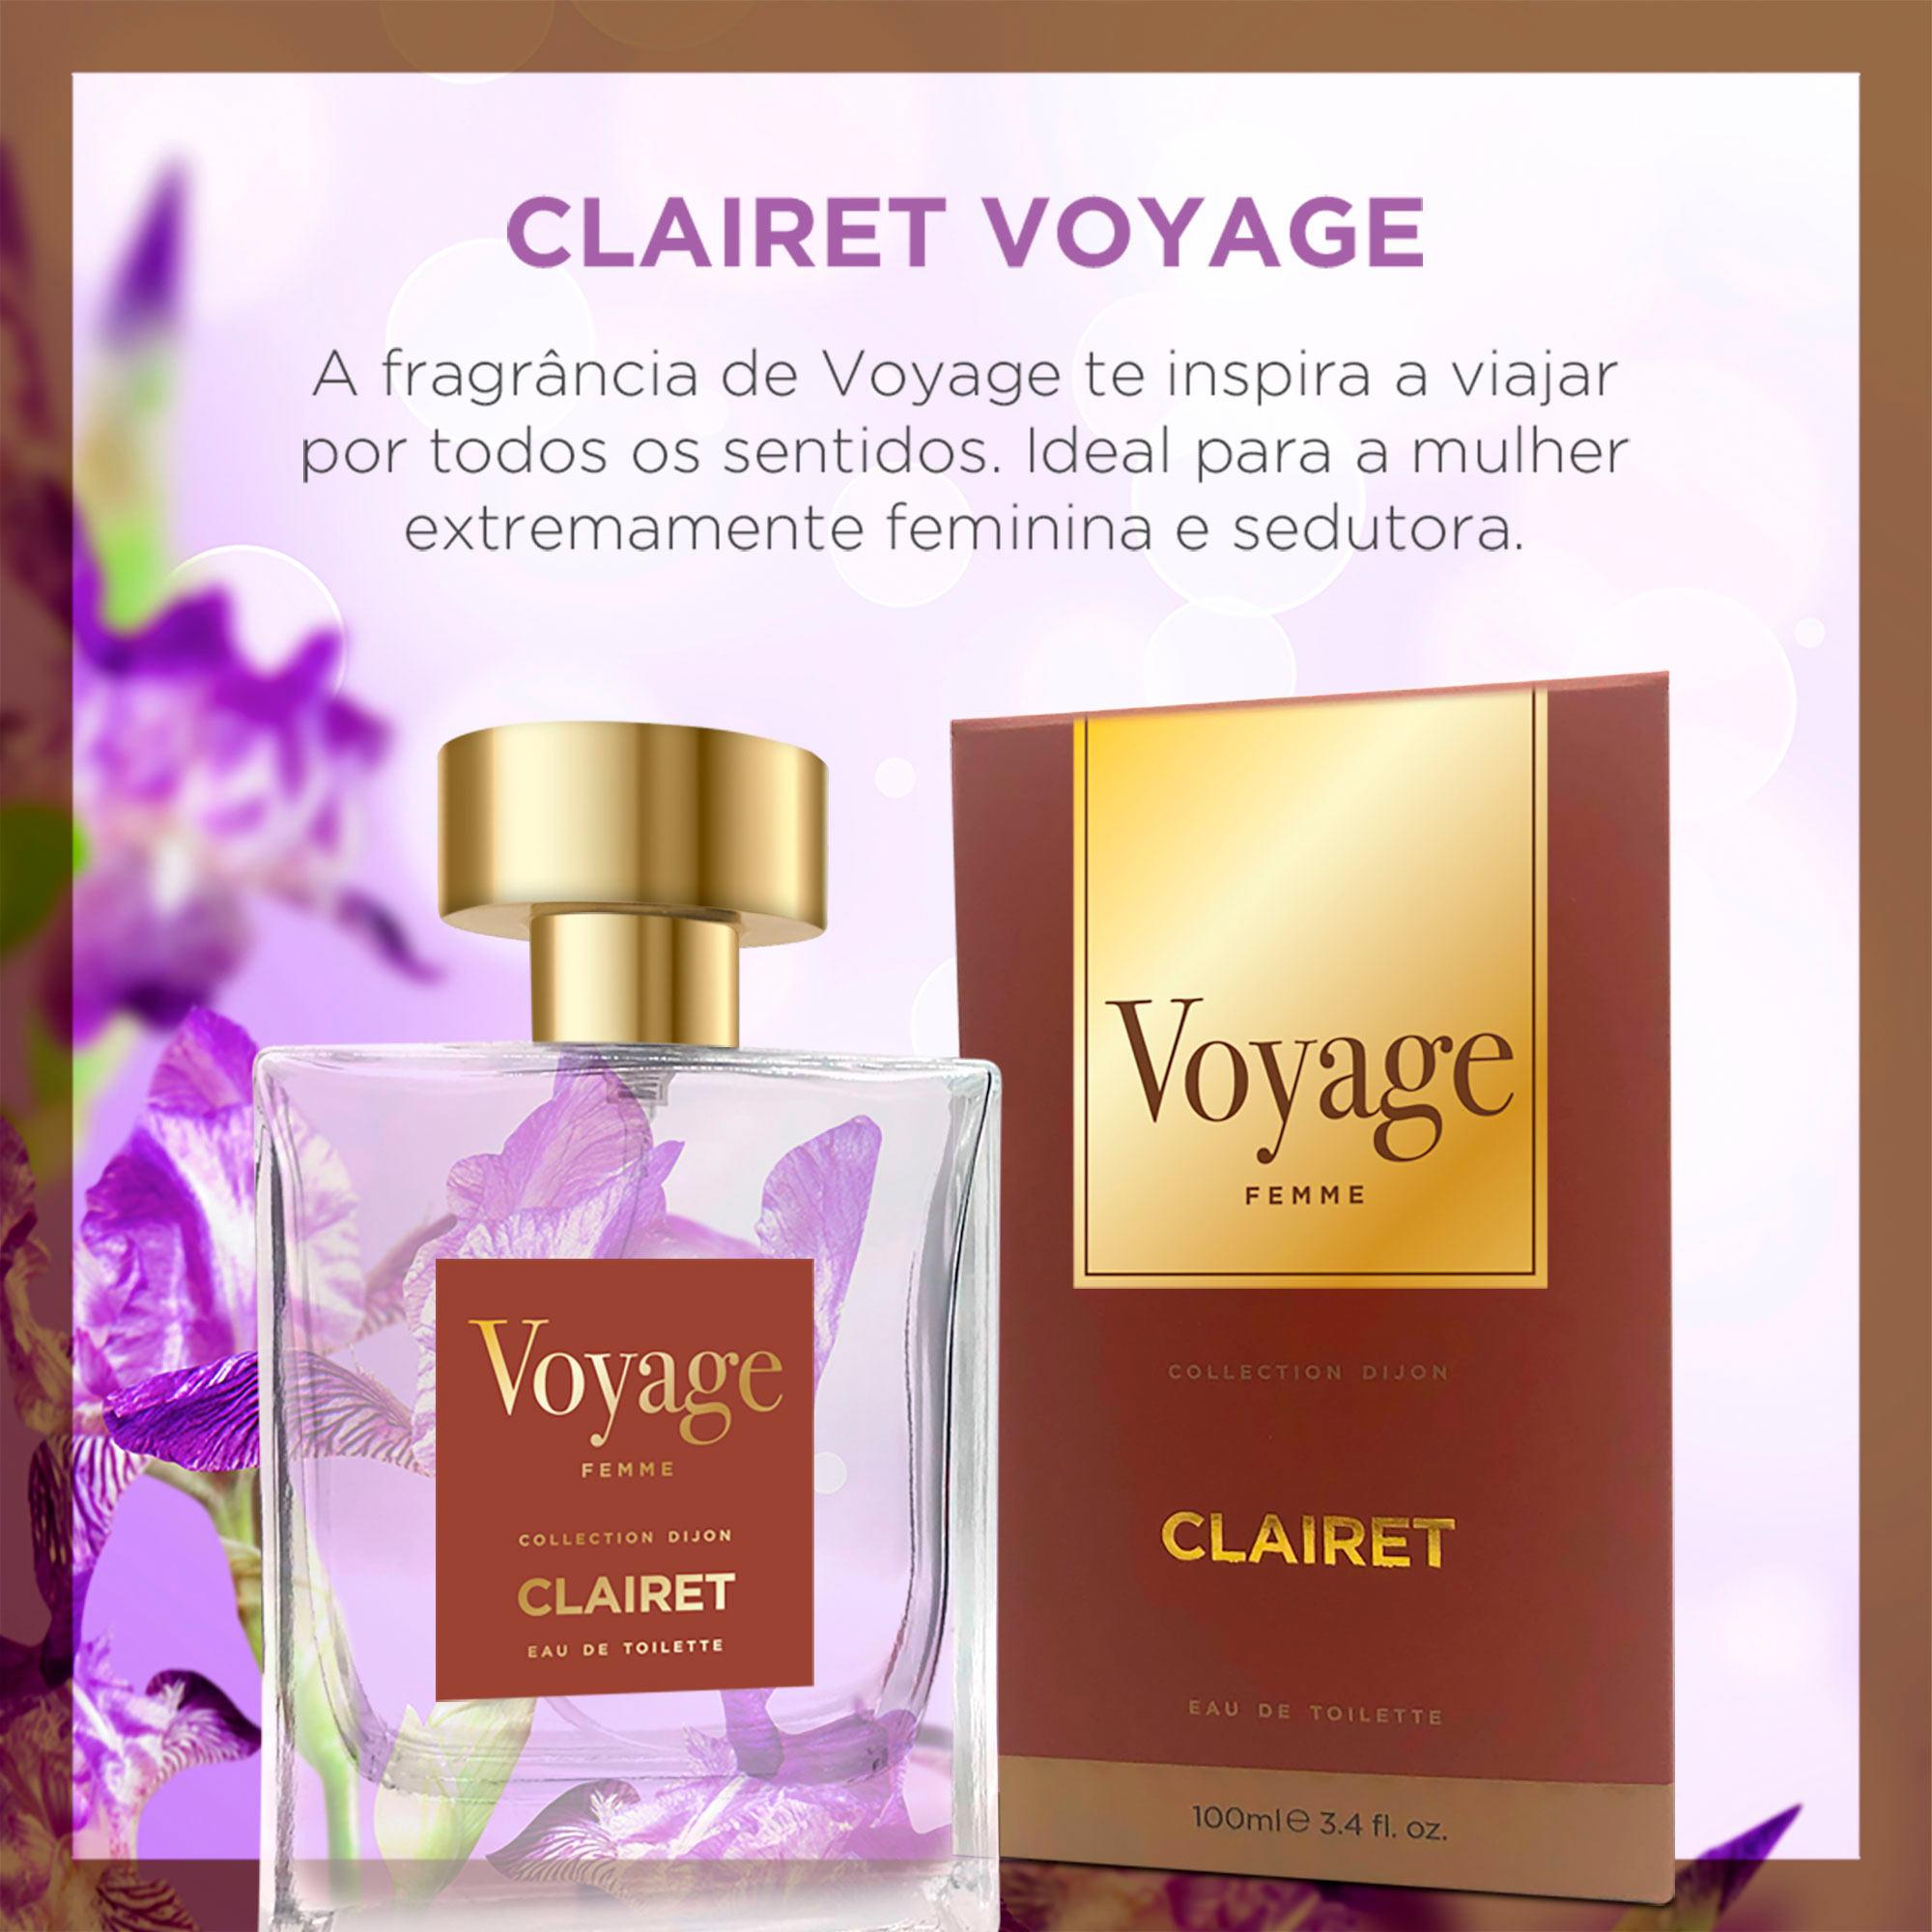 Clairet Voyage - Collection Dijon